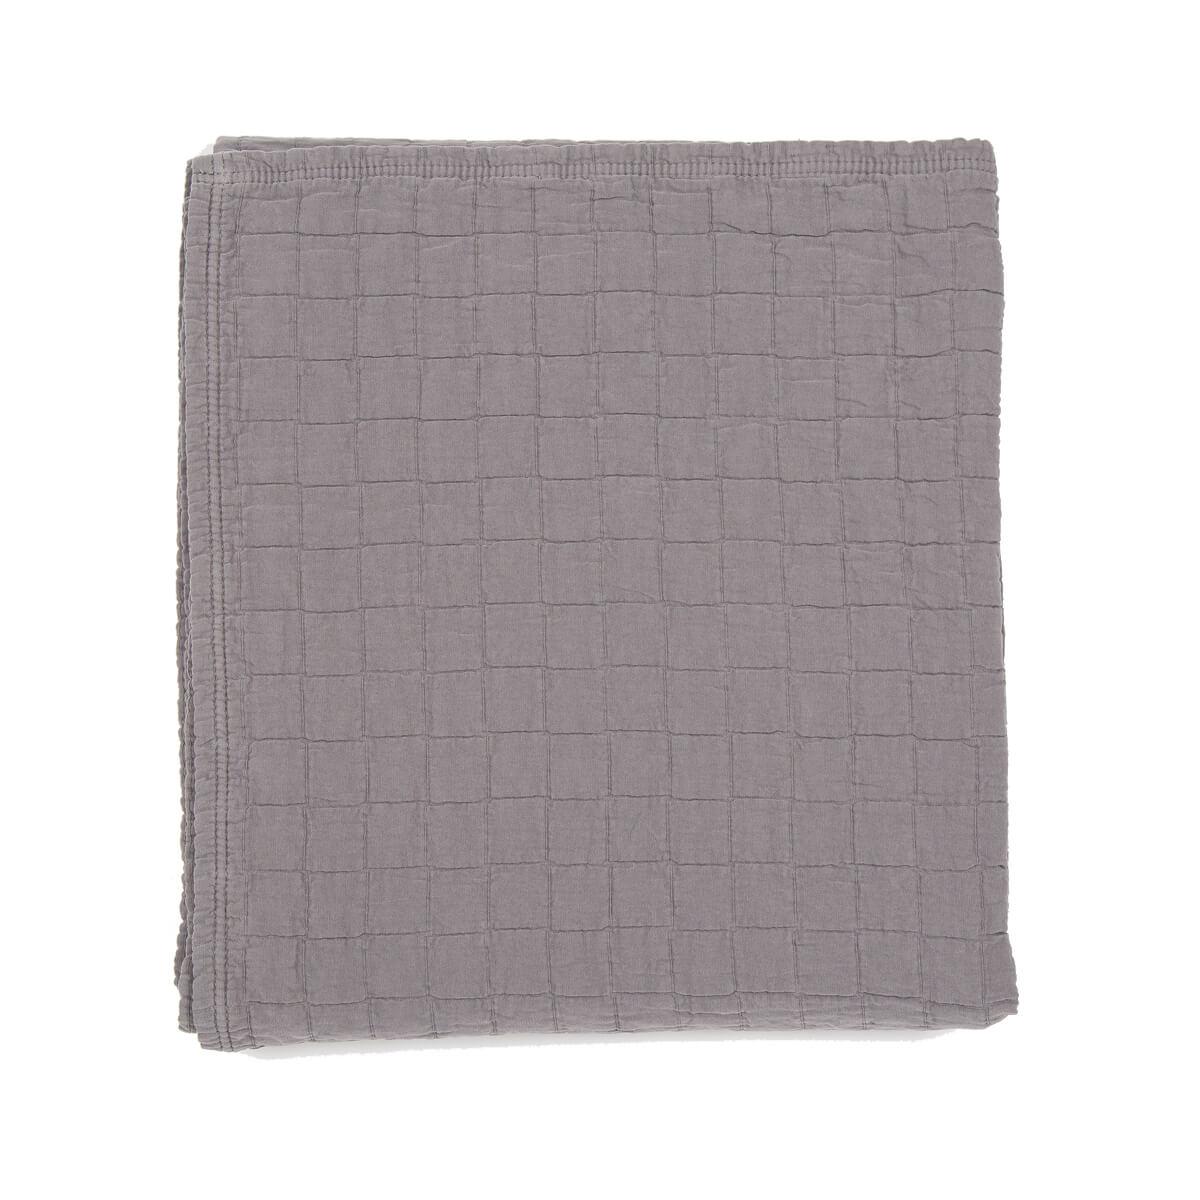 MATRI Aava bedspread d grey